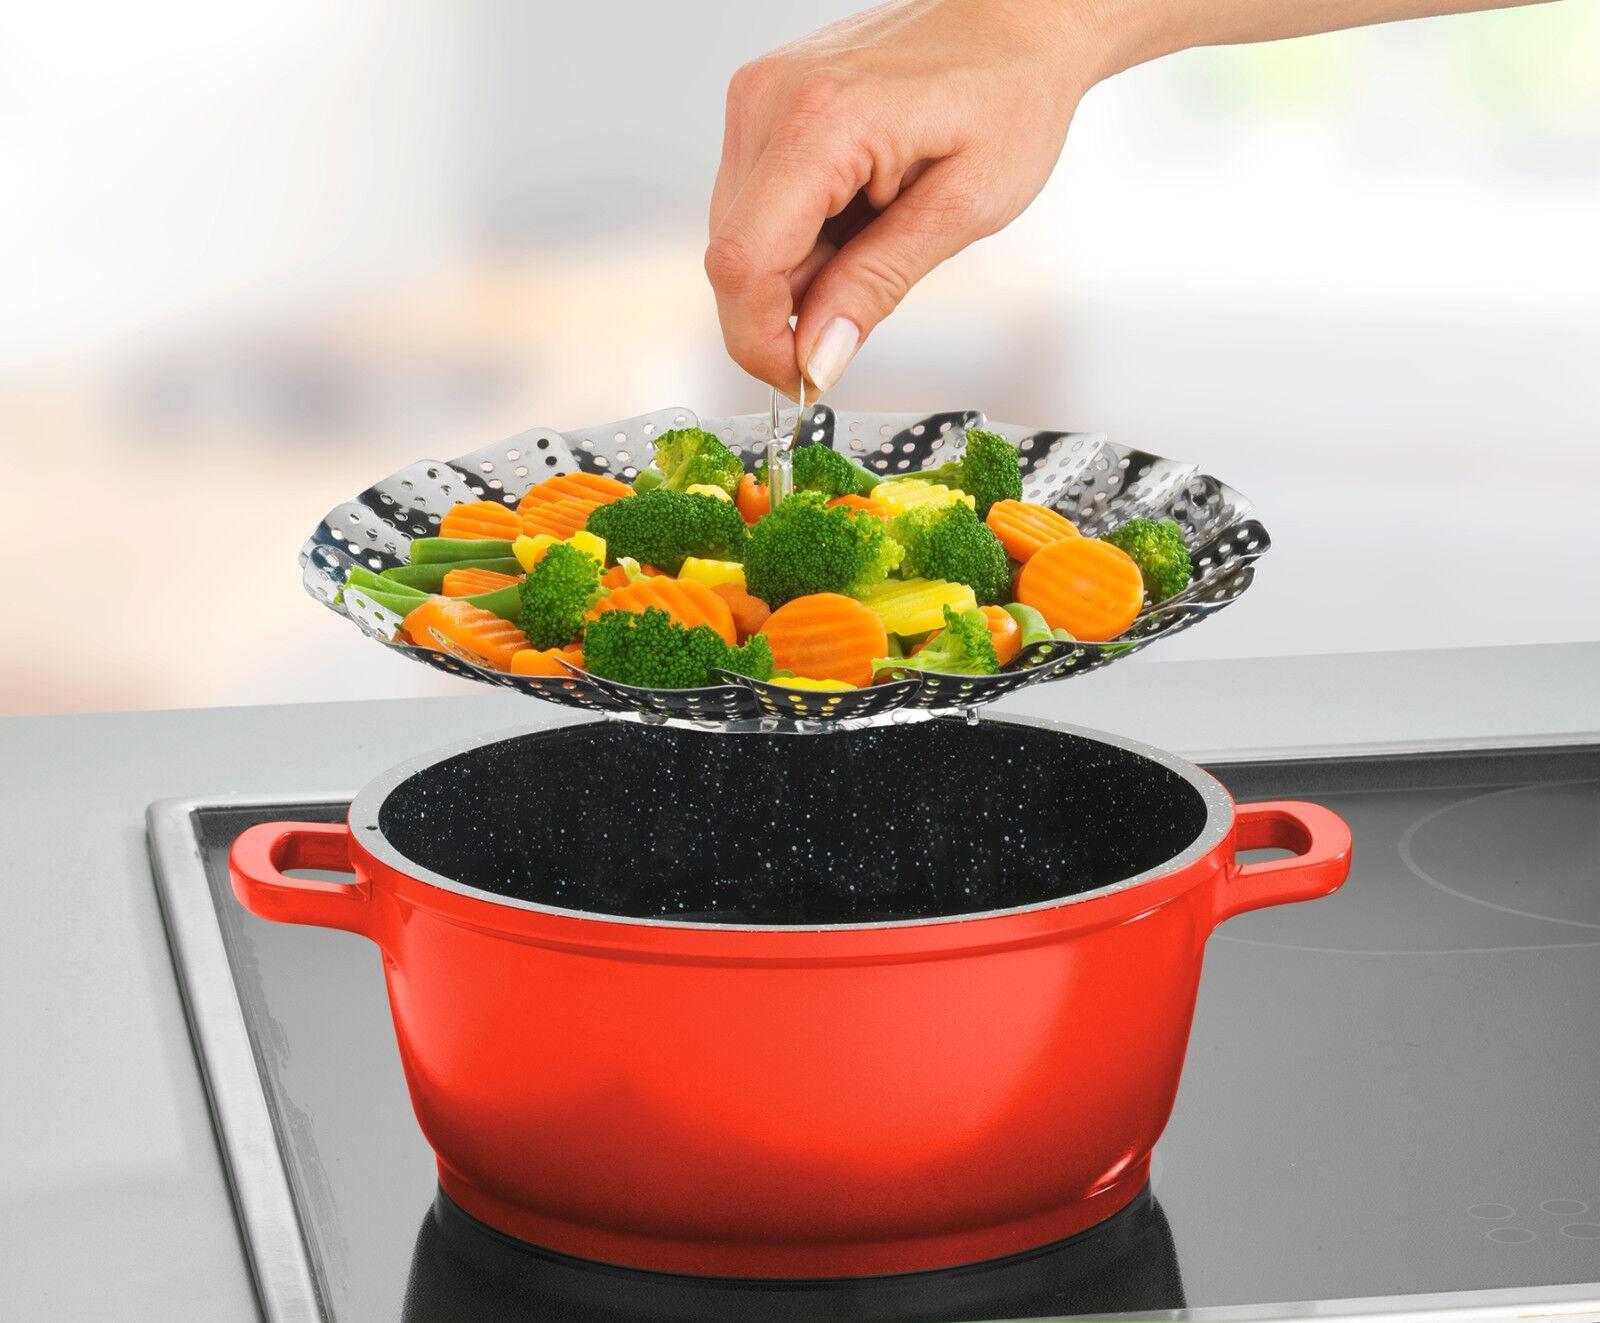 DAMPFGARER GAREINSATZ TÖPFE EDELSTAHL Dünster Dämpfen Gemüse Dünsteinsatz Kochen